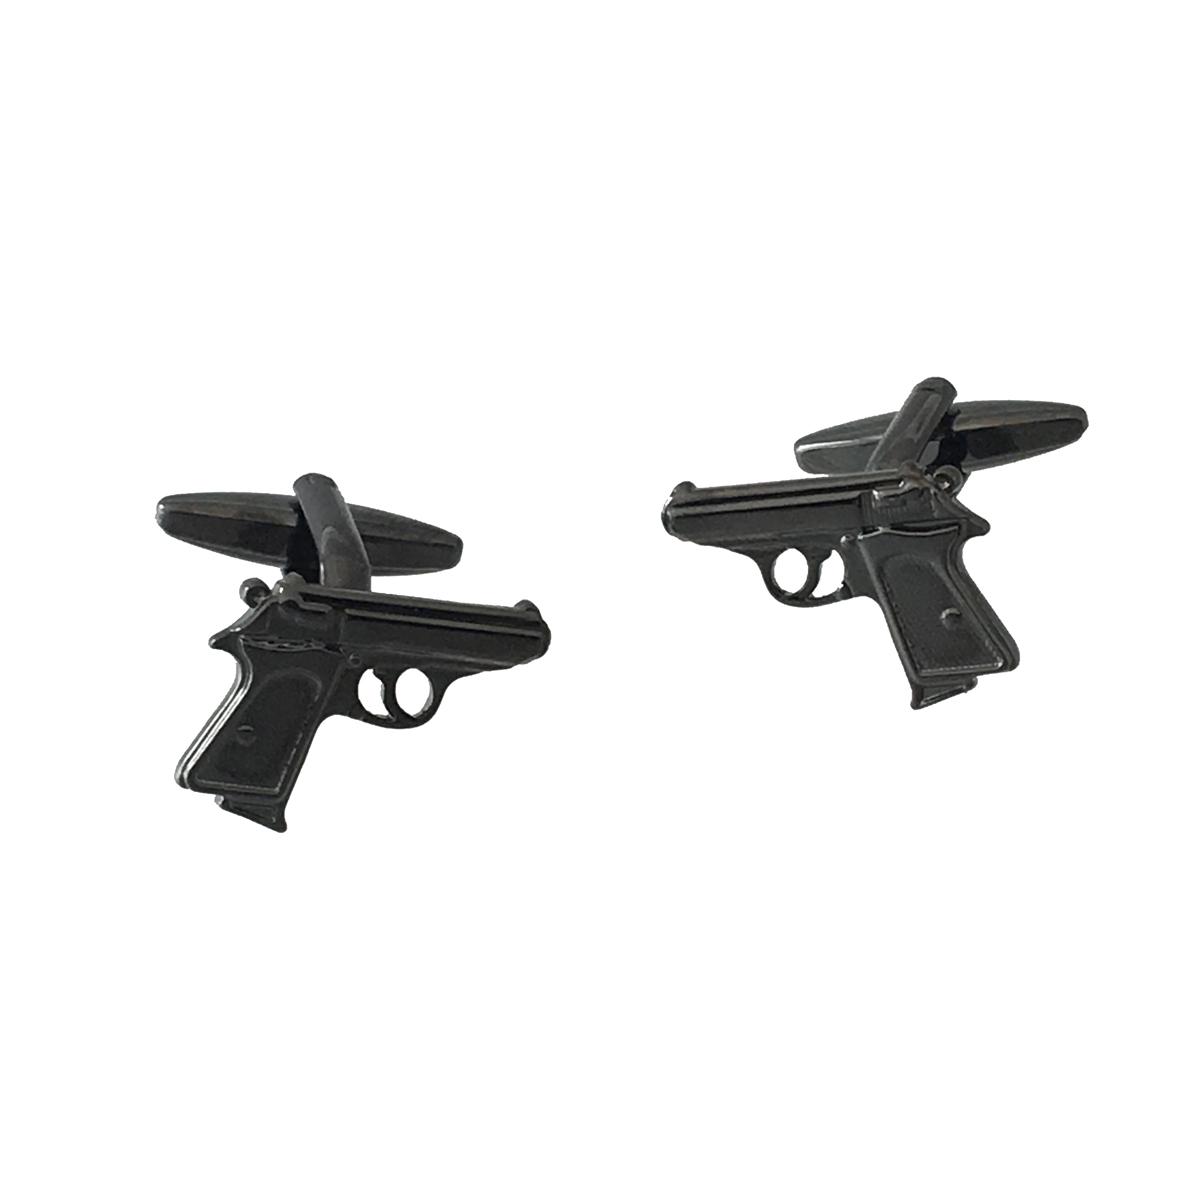 Bullet in Gun Chamber Cufflinks in a Personalised Cufflink Box